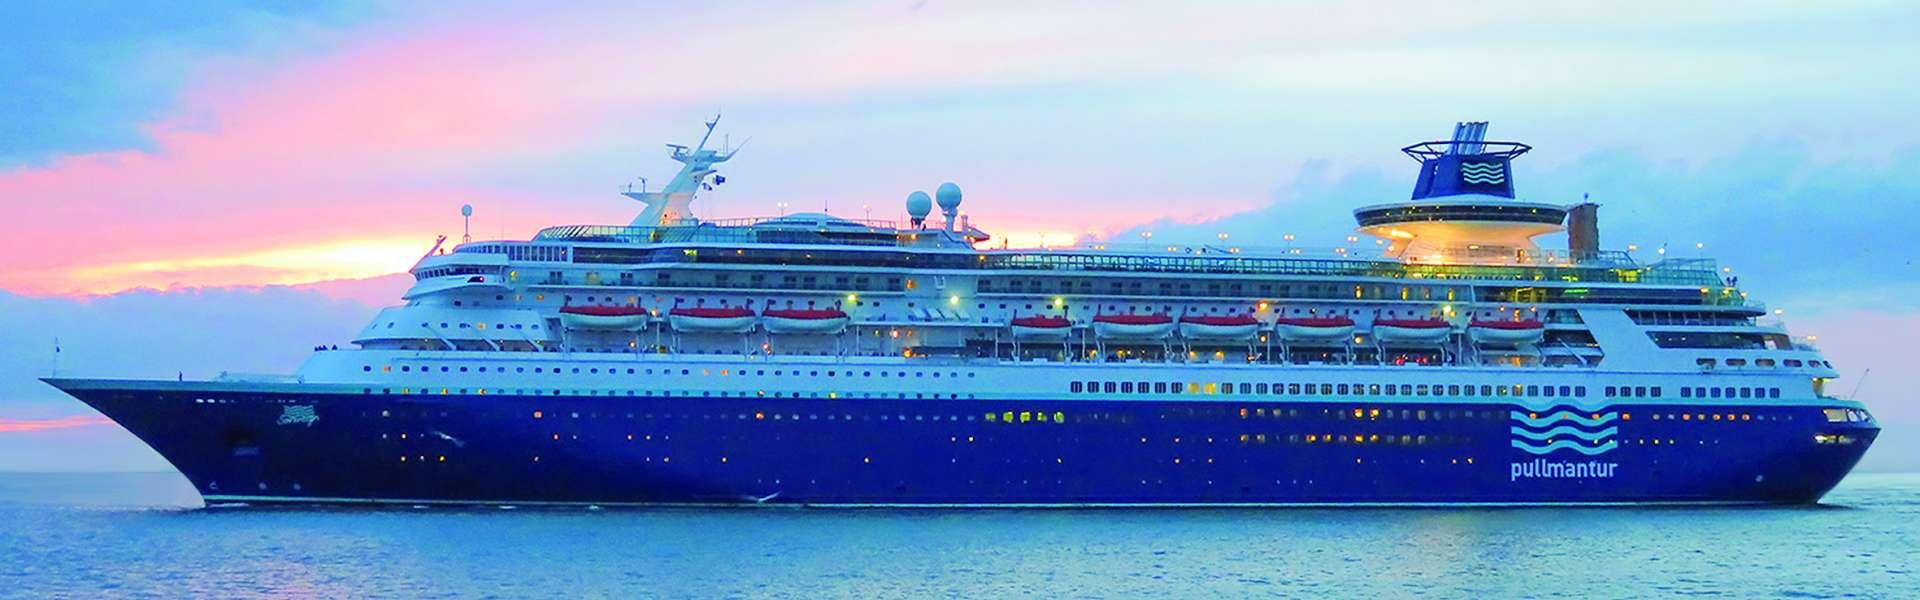 Croaziera 2019 - Mediterana de Vest (Barcelona)  - Pullmantur Cruises - Sovereign - 7 nopti